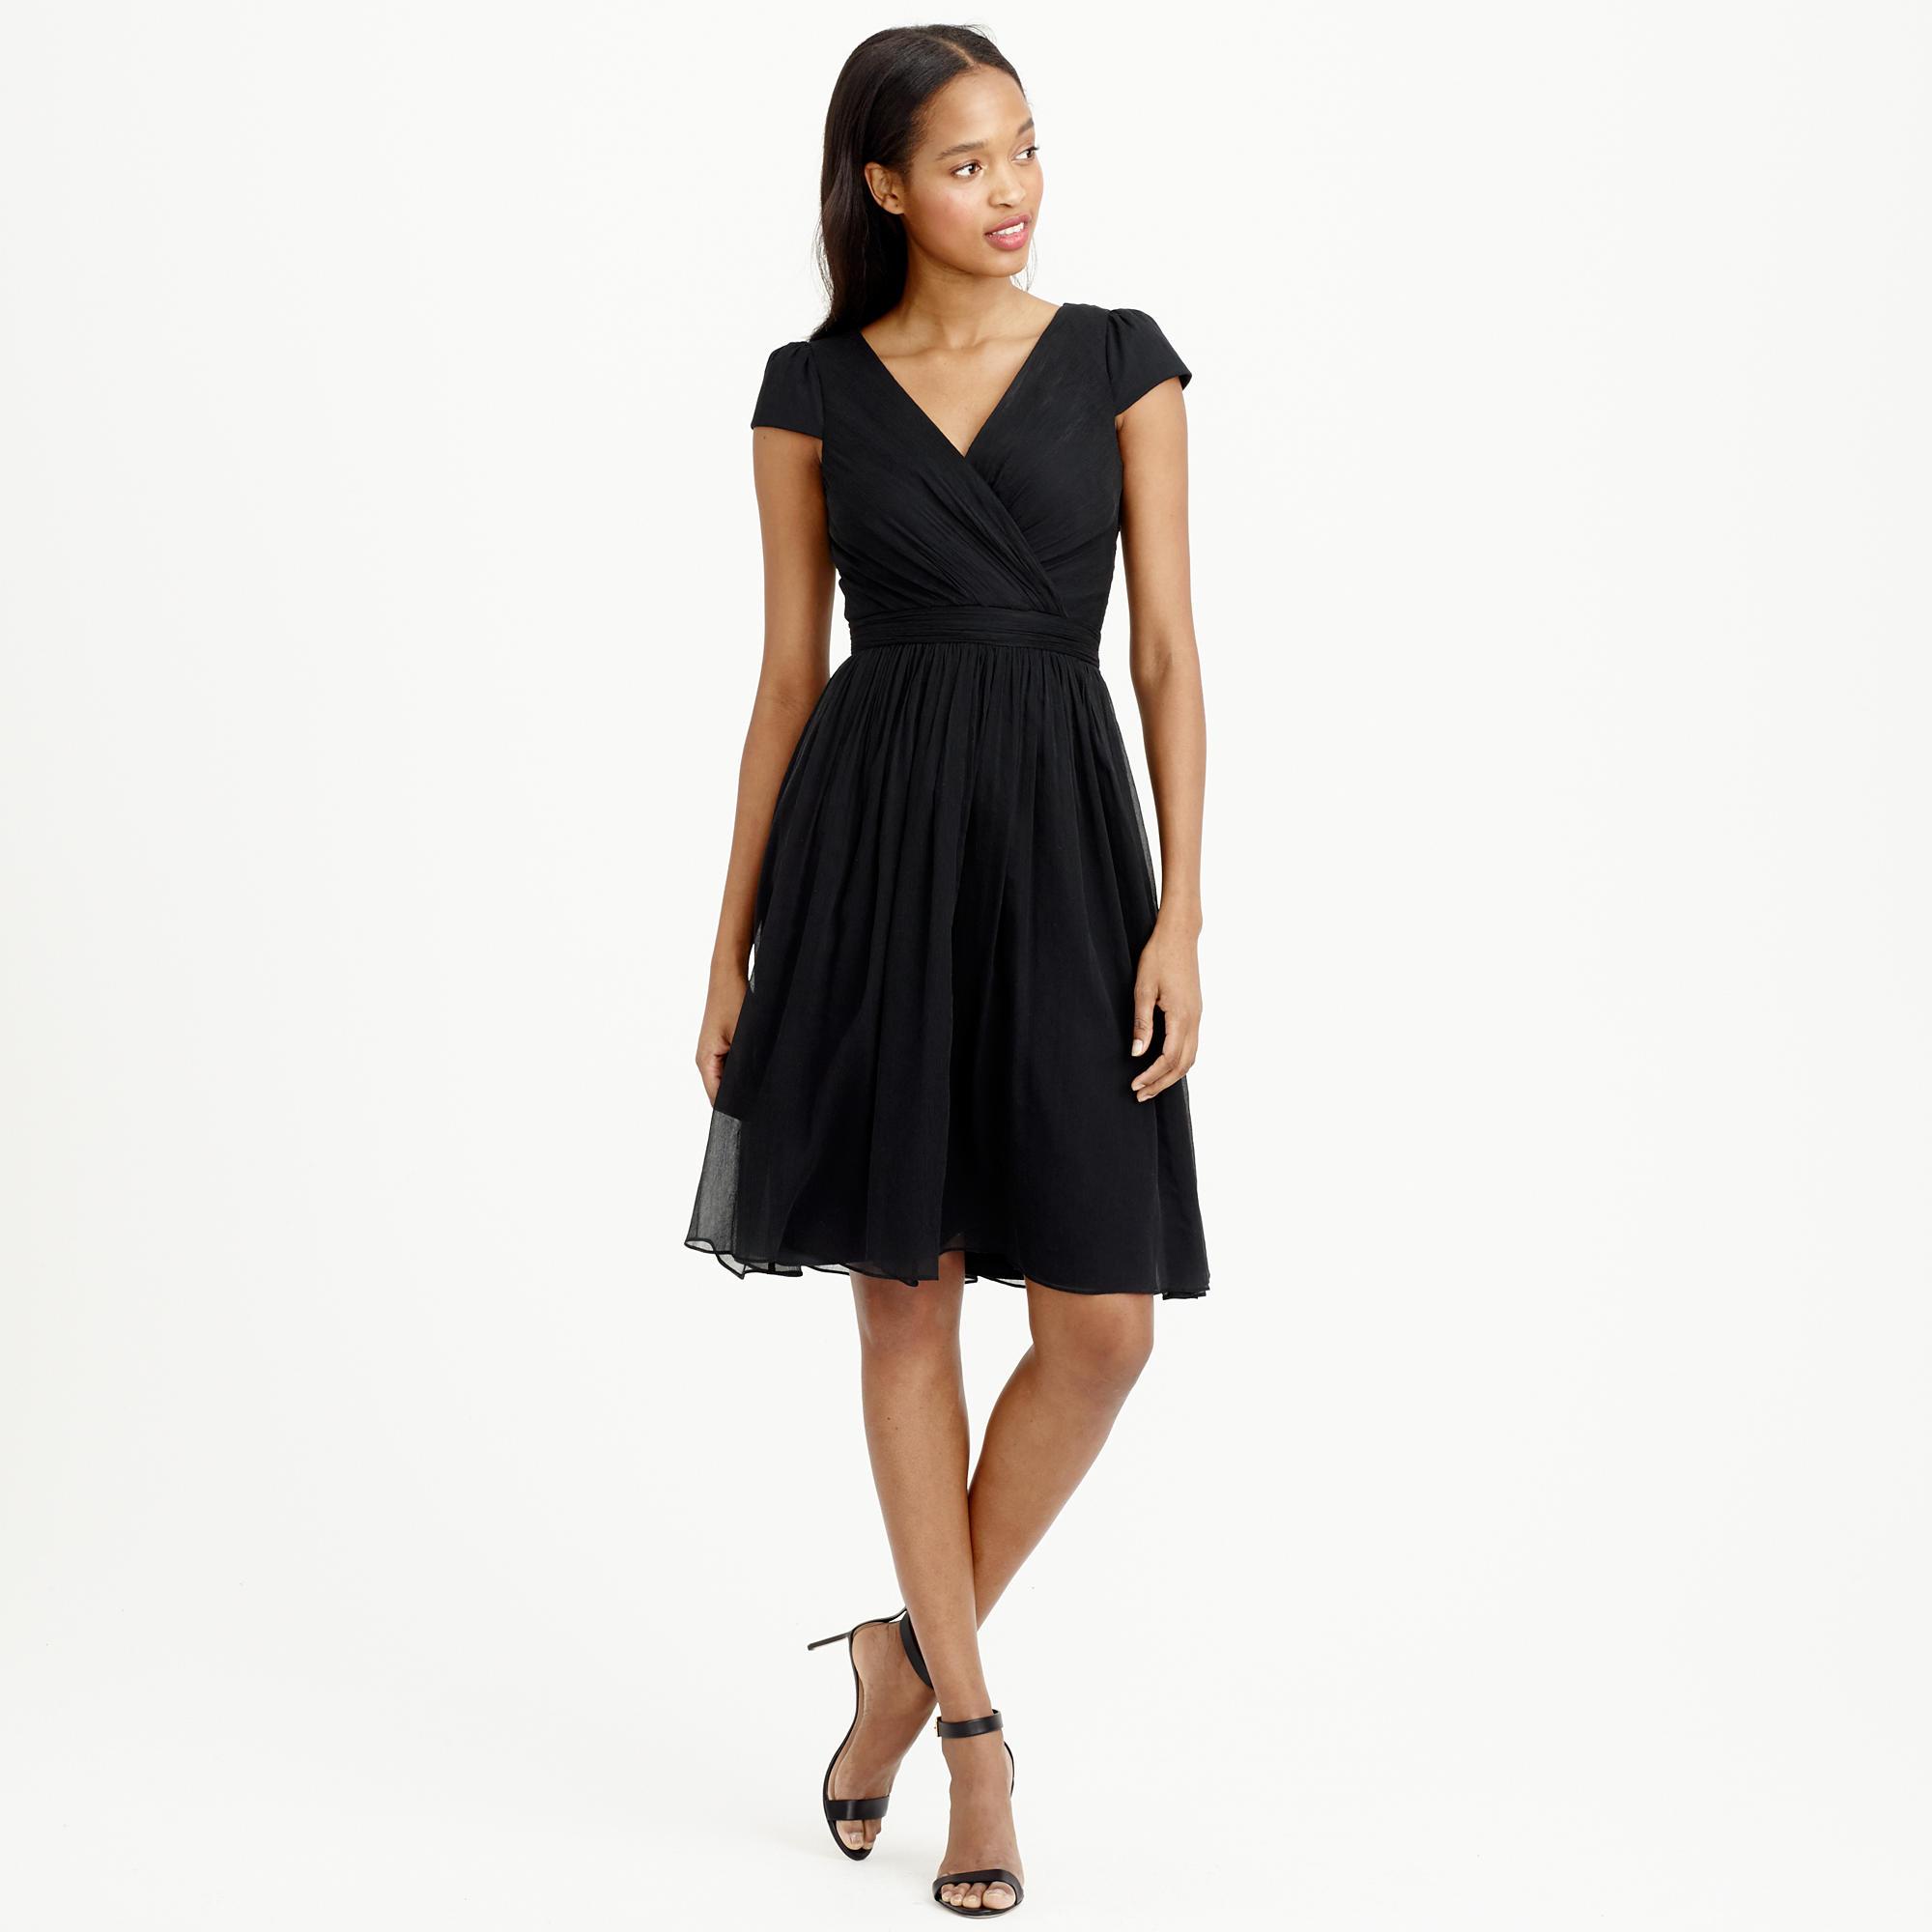 Black dress j crew - Black Dress J Crew 2